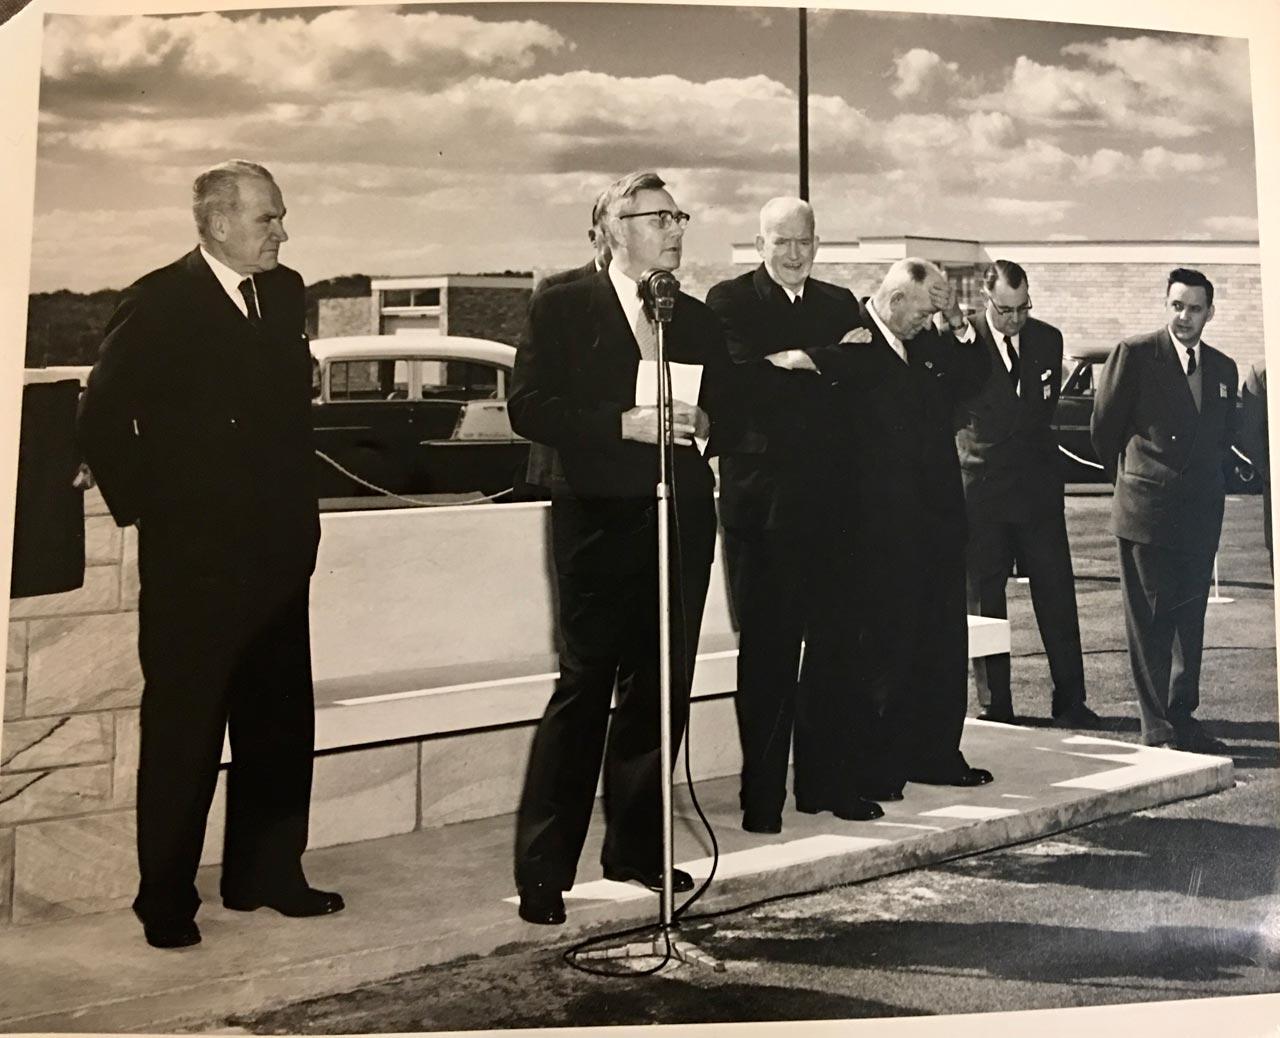 Opening Kurnell refinery. Australia, August, 1956.